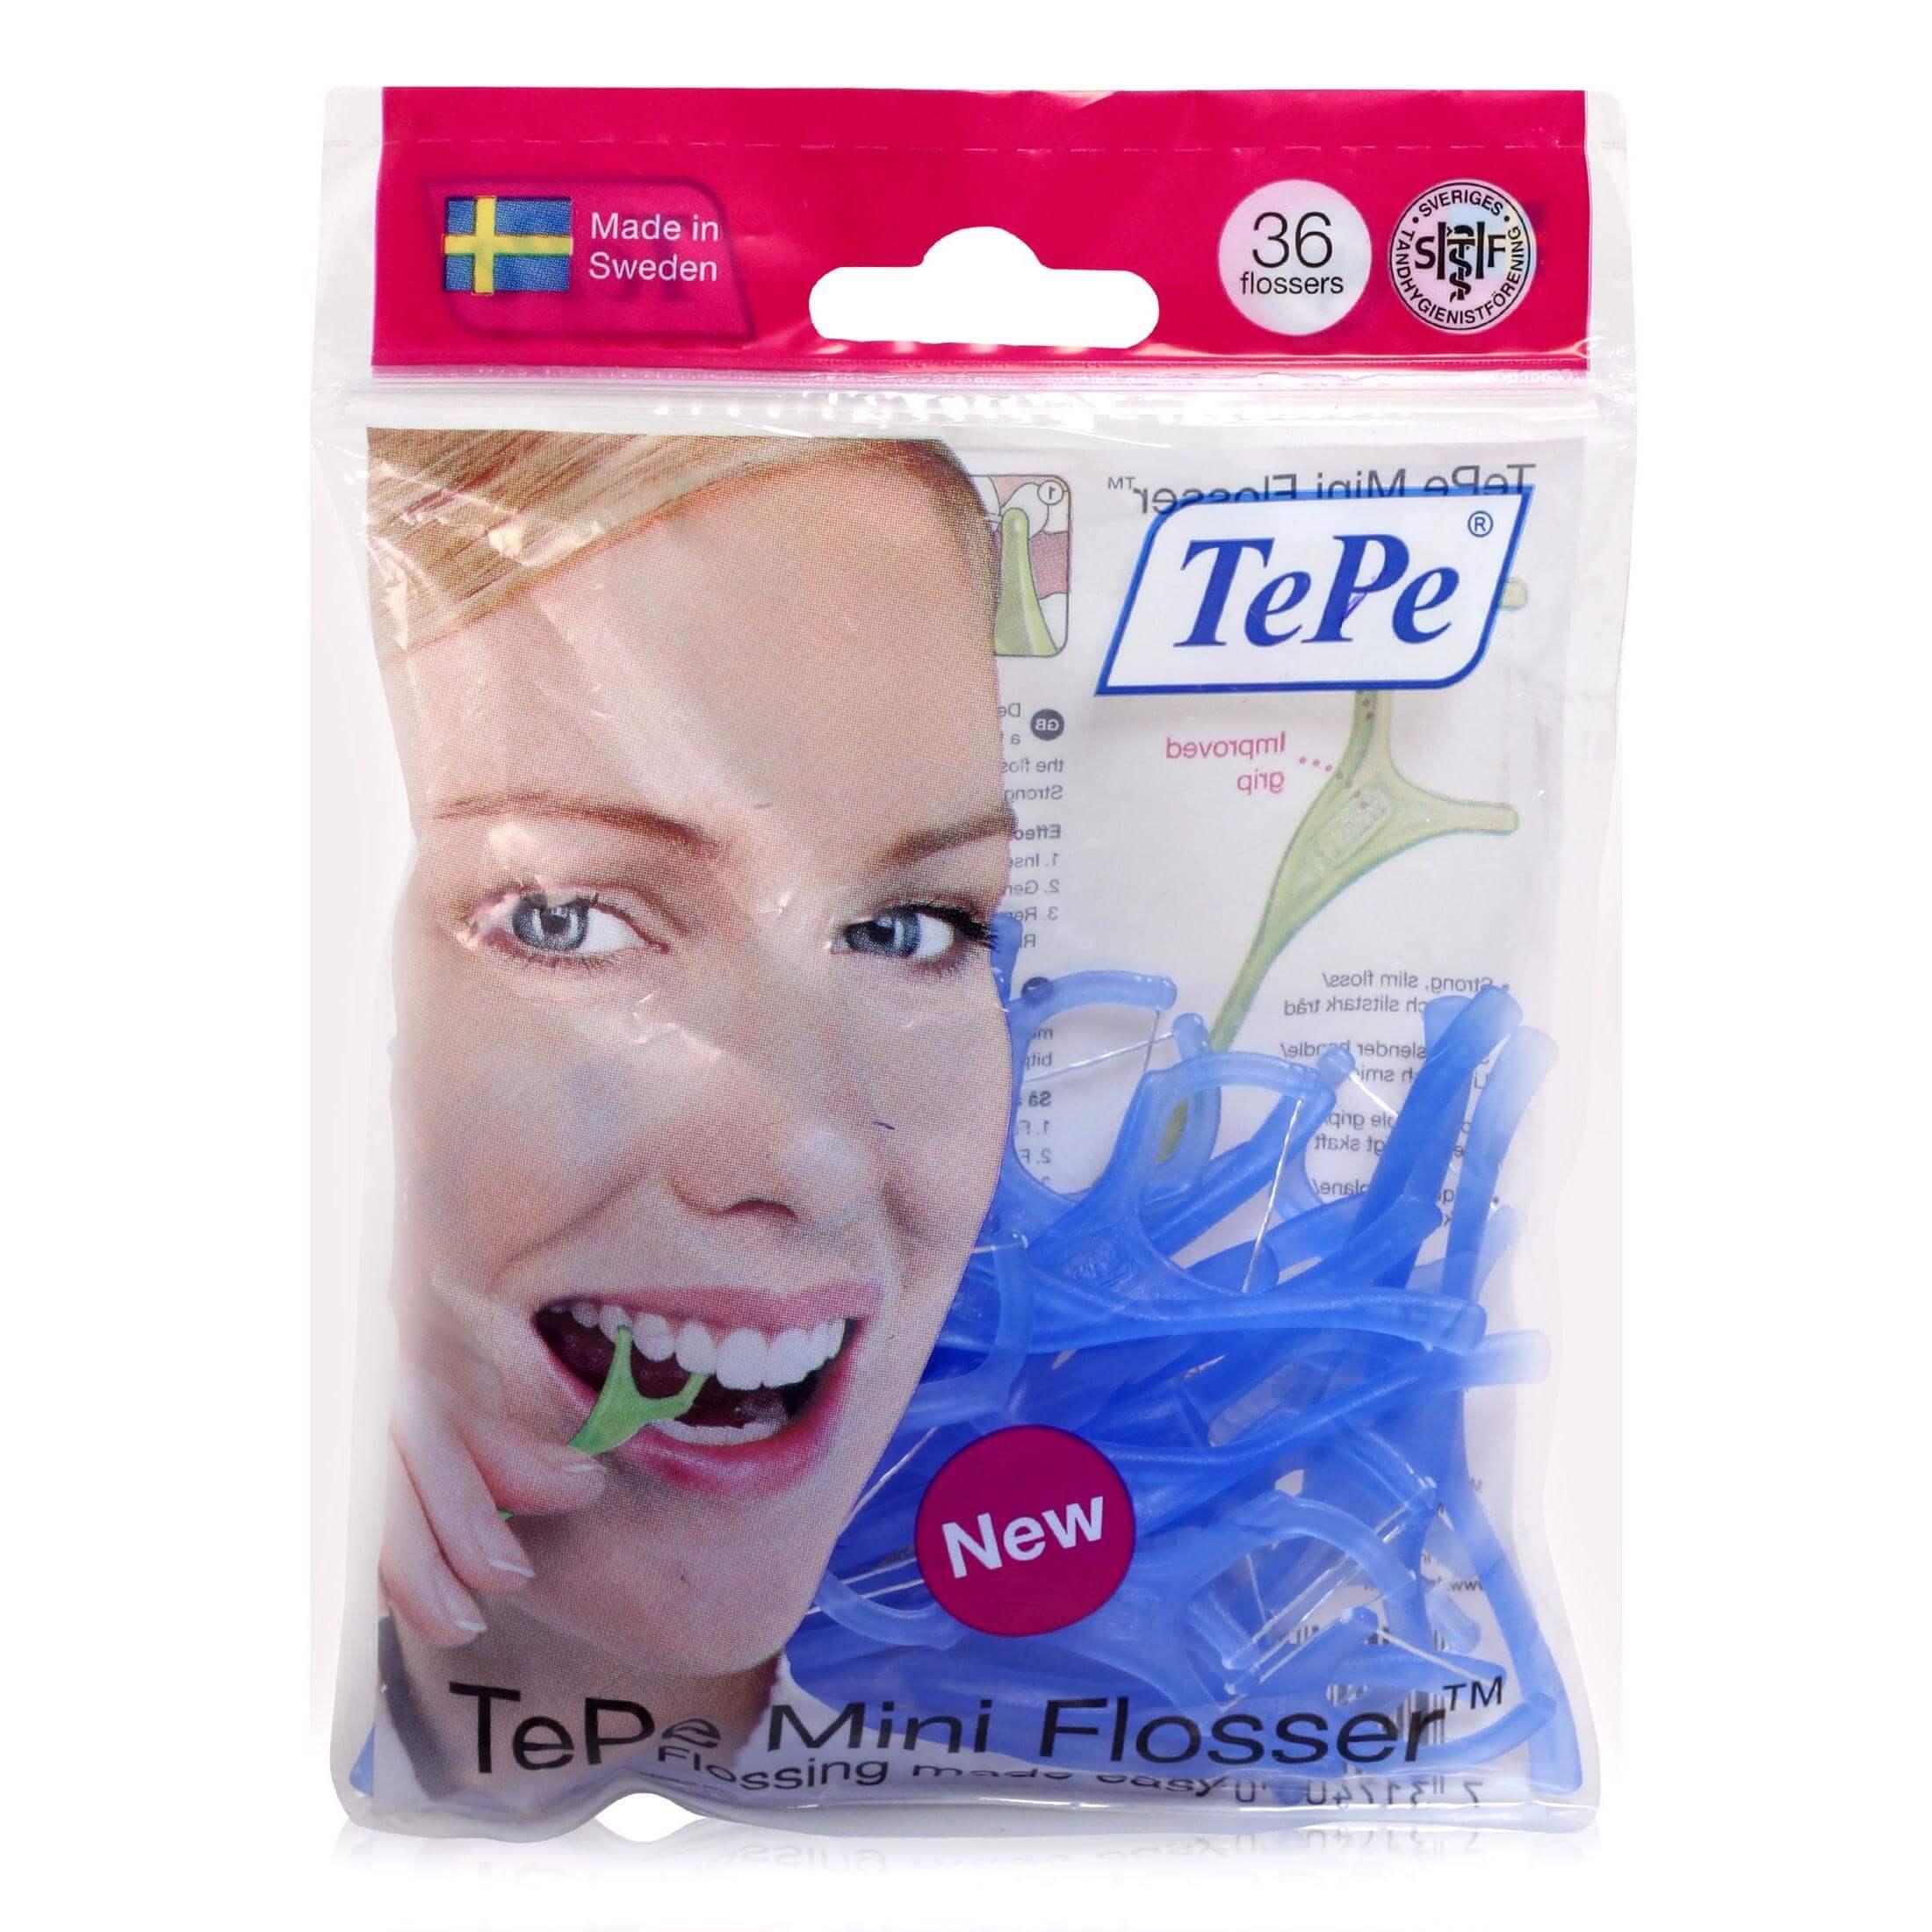 Tepe Mini Flosser Για Απαλό Και Ααποτελεσματικό Καθαρισμό Ανάμεσα Στα Δόντια